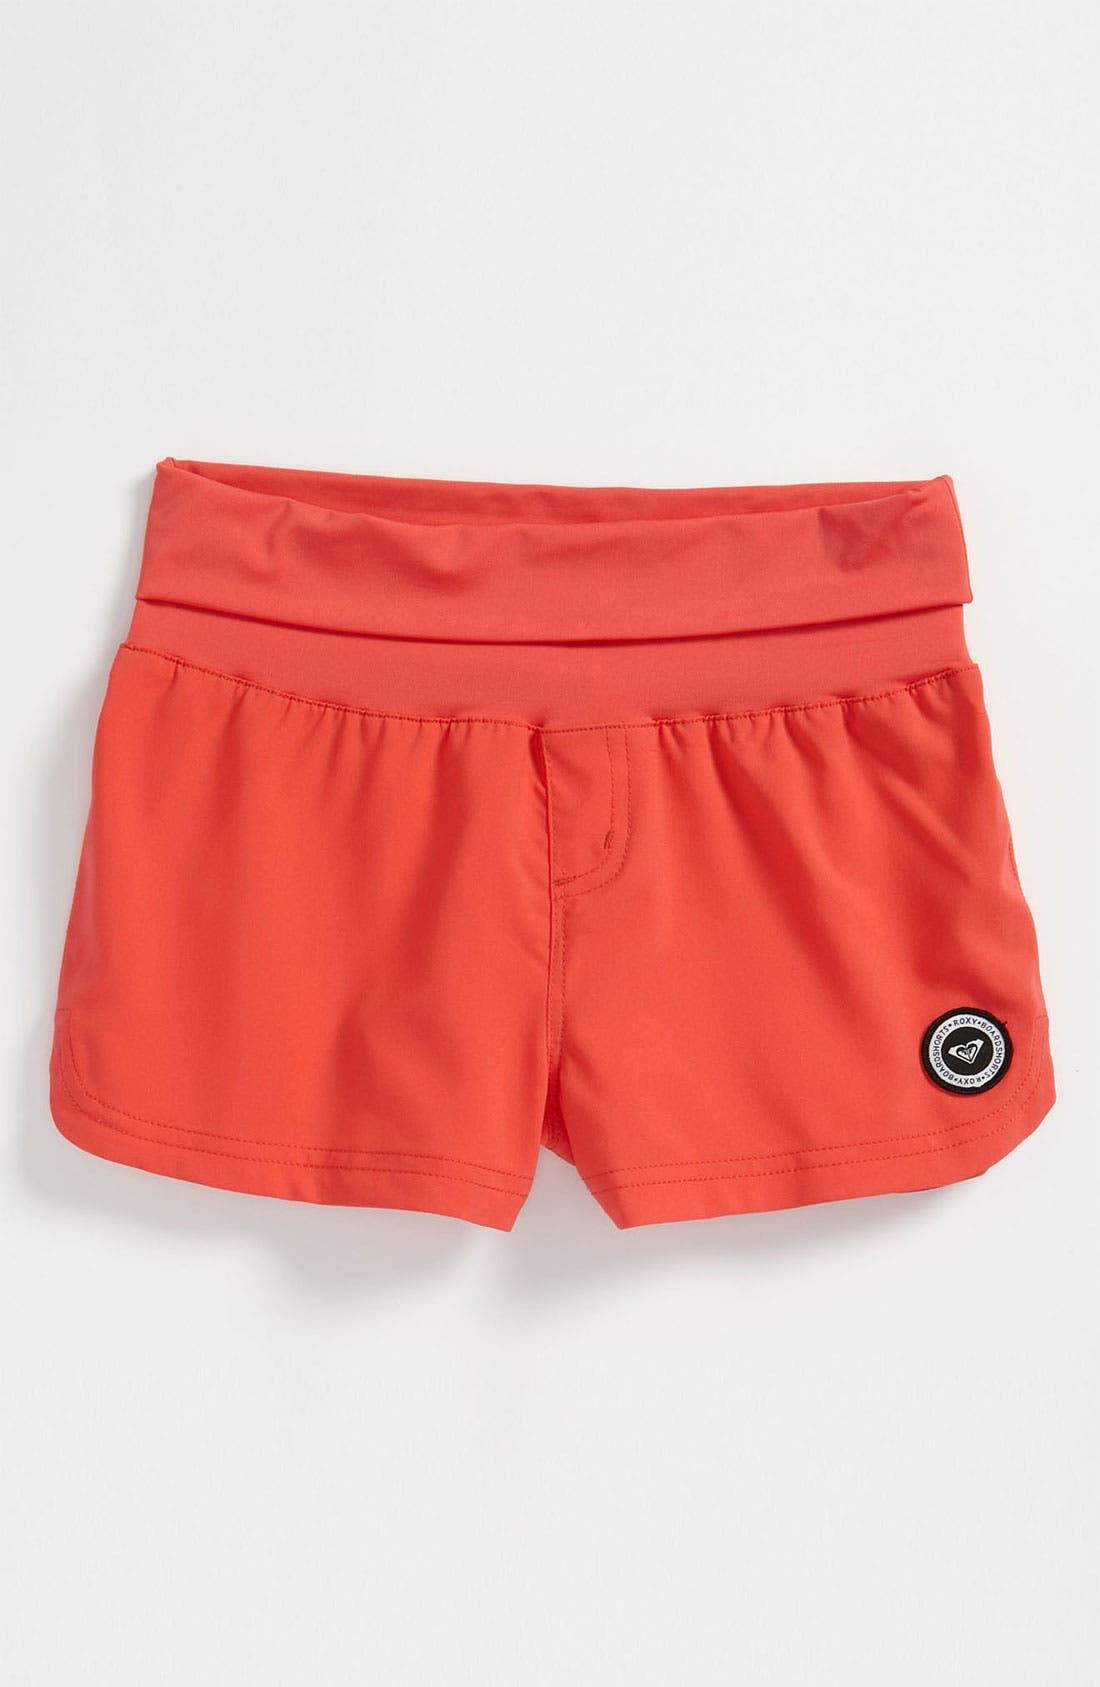 Main Image - Roxy Solid Board Shorts (Big Girls)